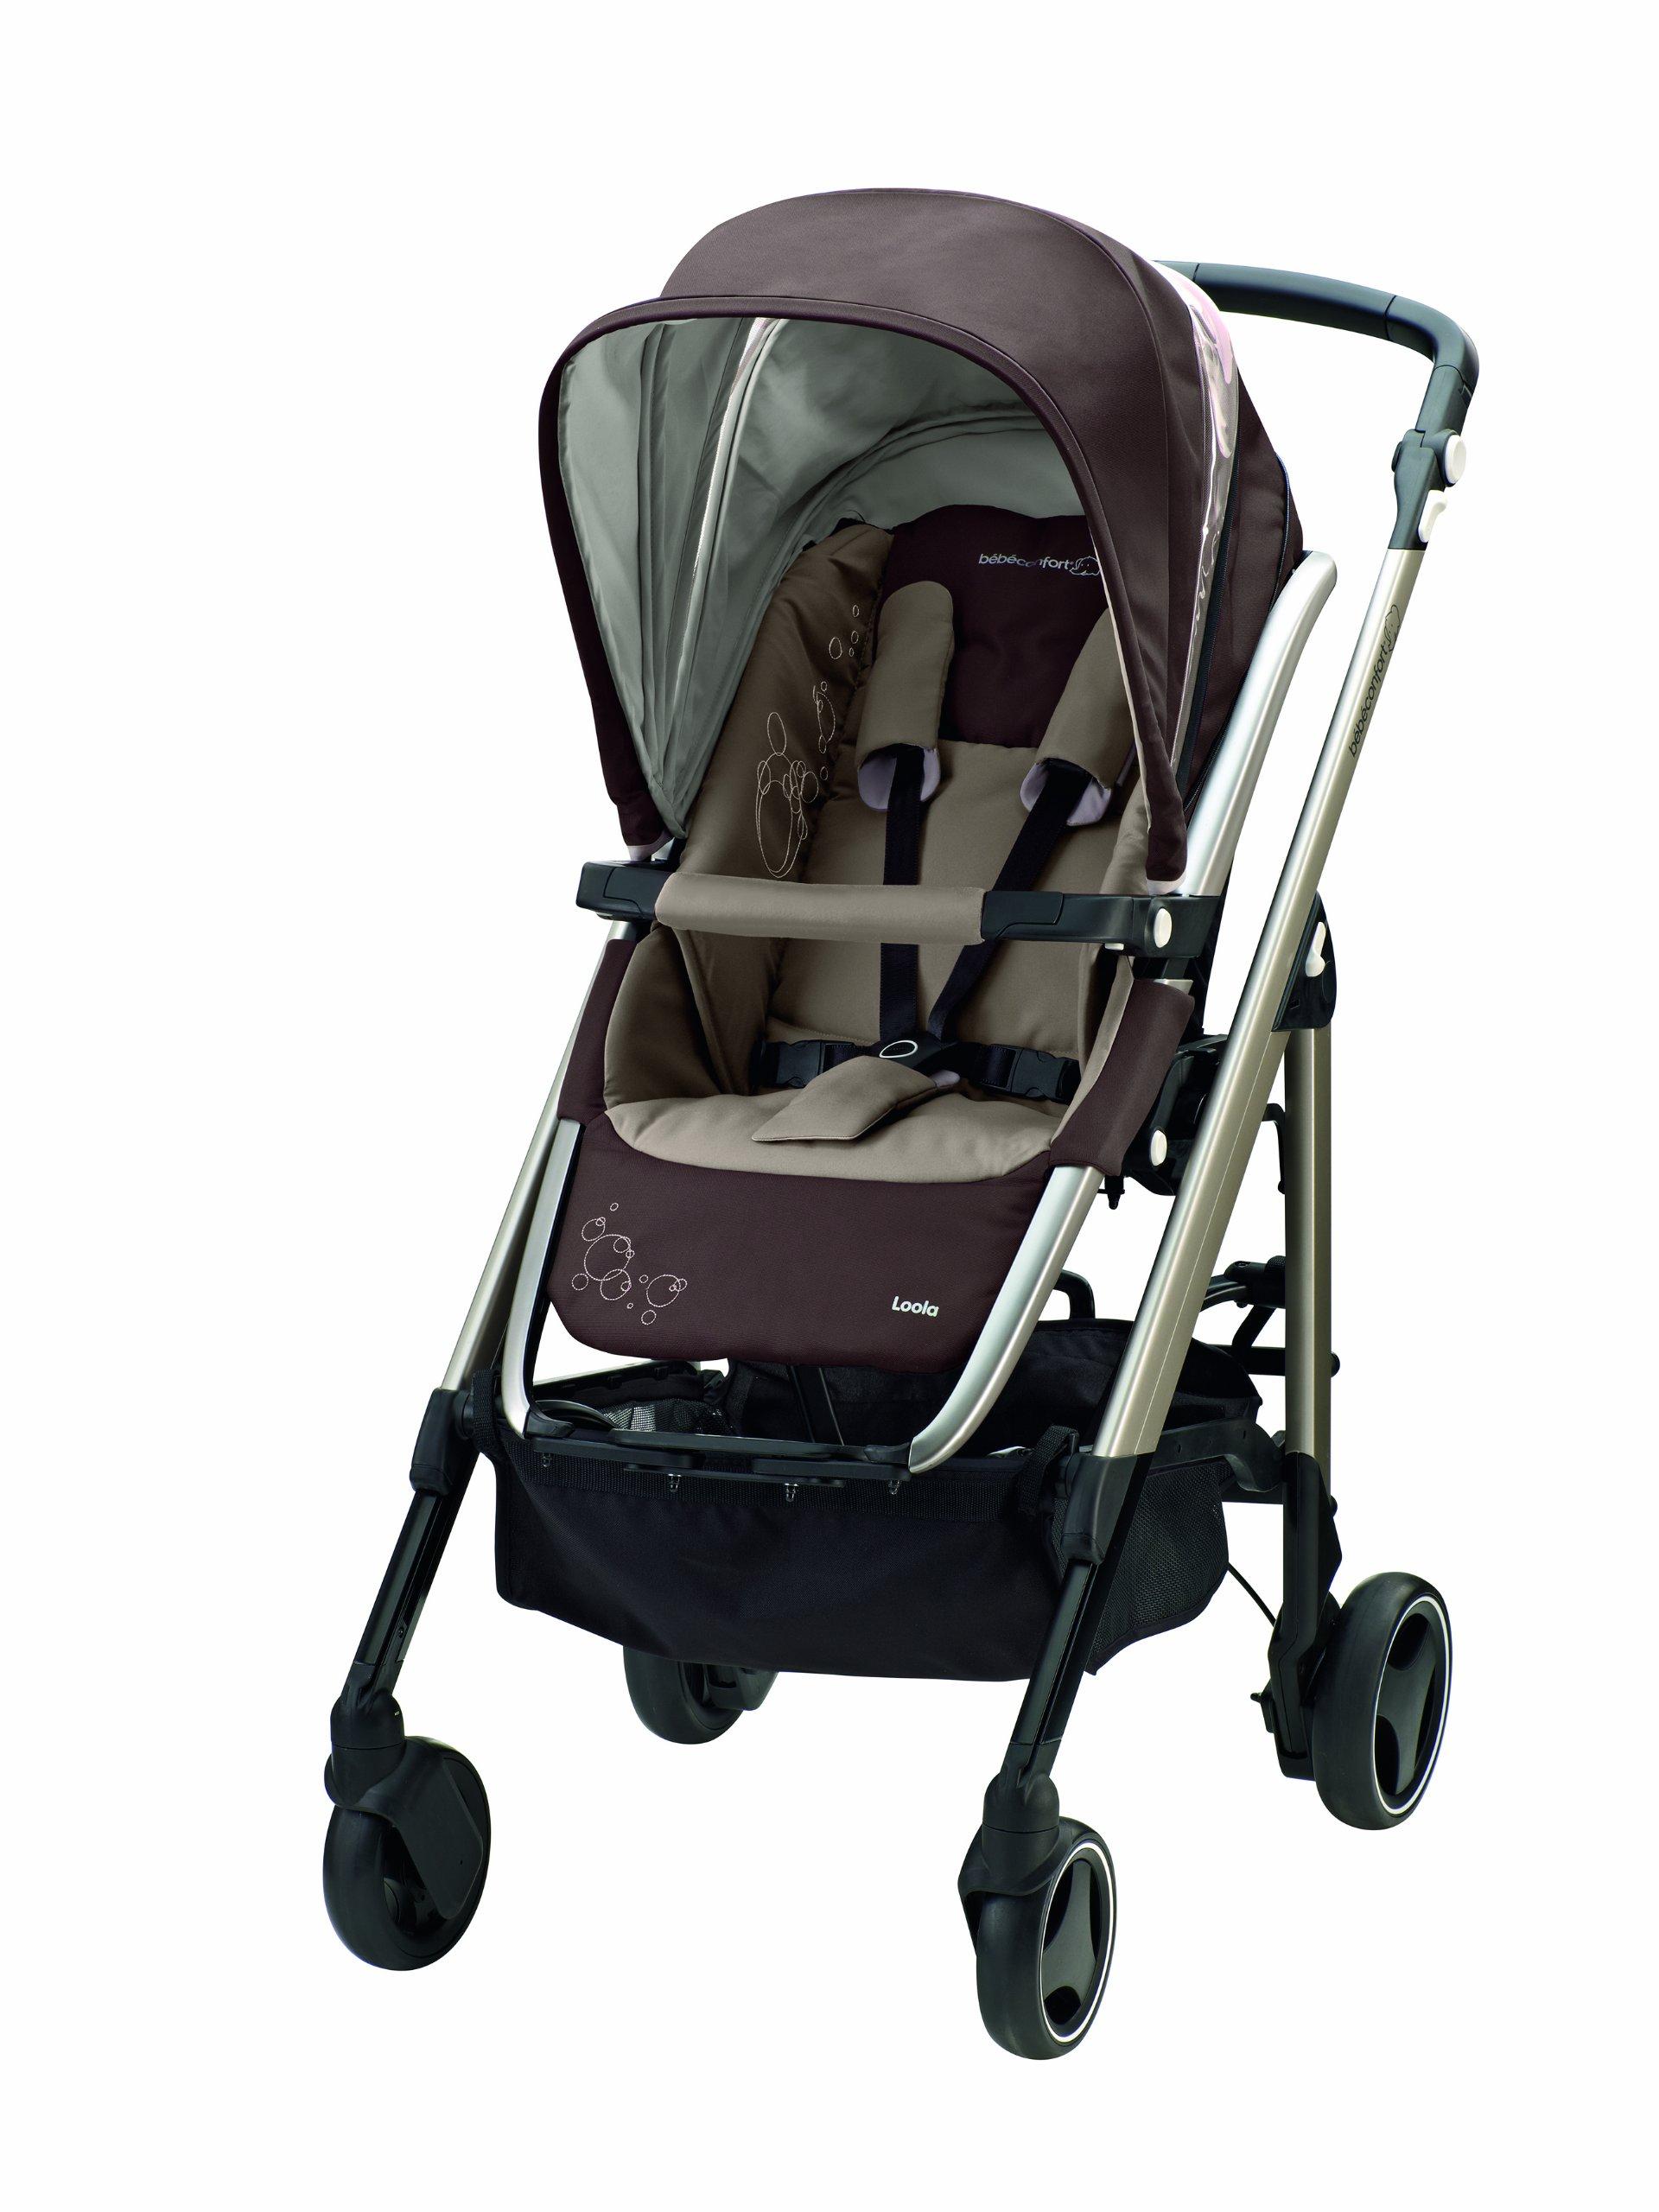 Bébé Confort 13825350 New Loola Passeggino Modulare, Walnut Brown